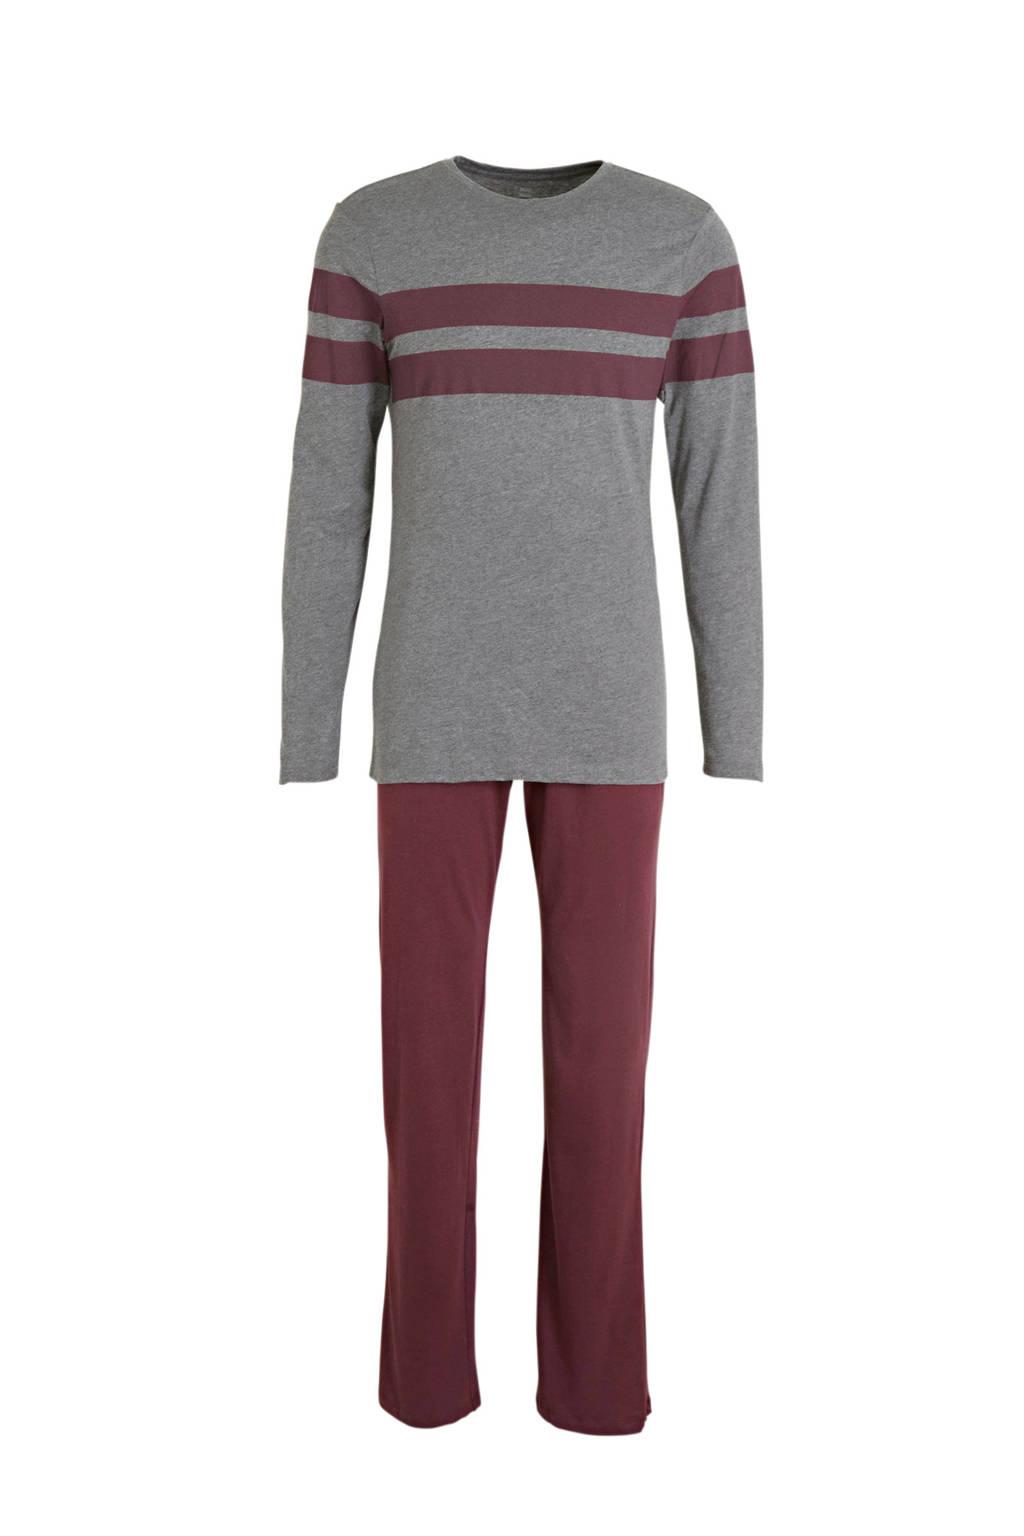 HEMA pyjama grijs/bordeaux, Grijs/bordeaux